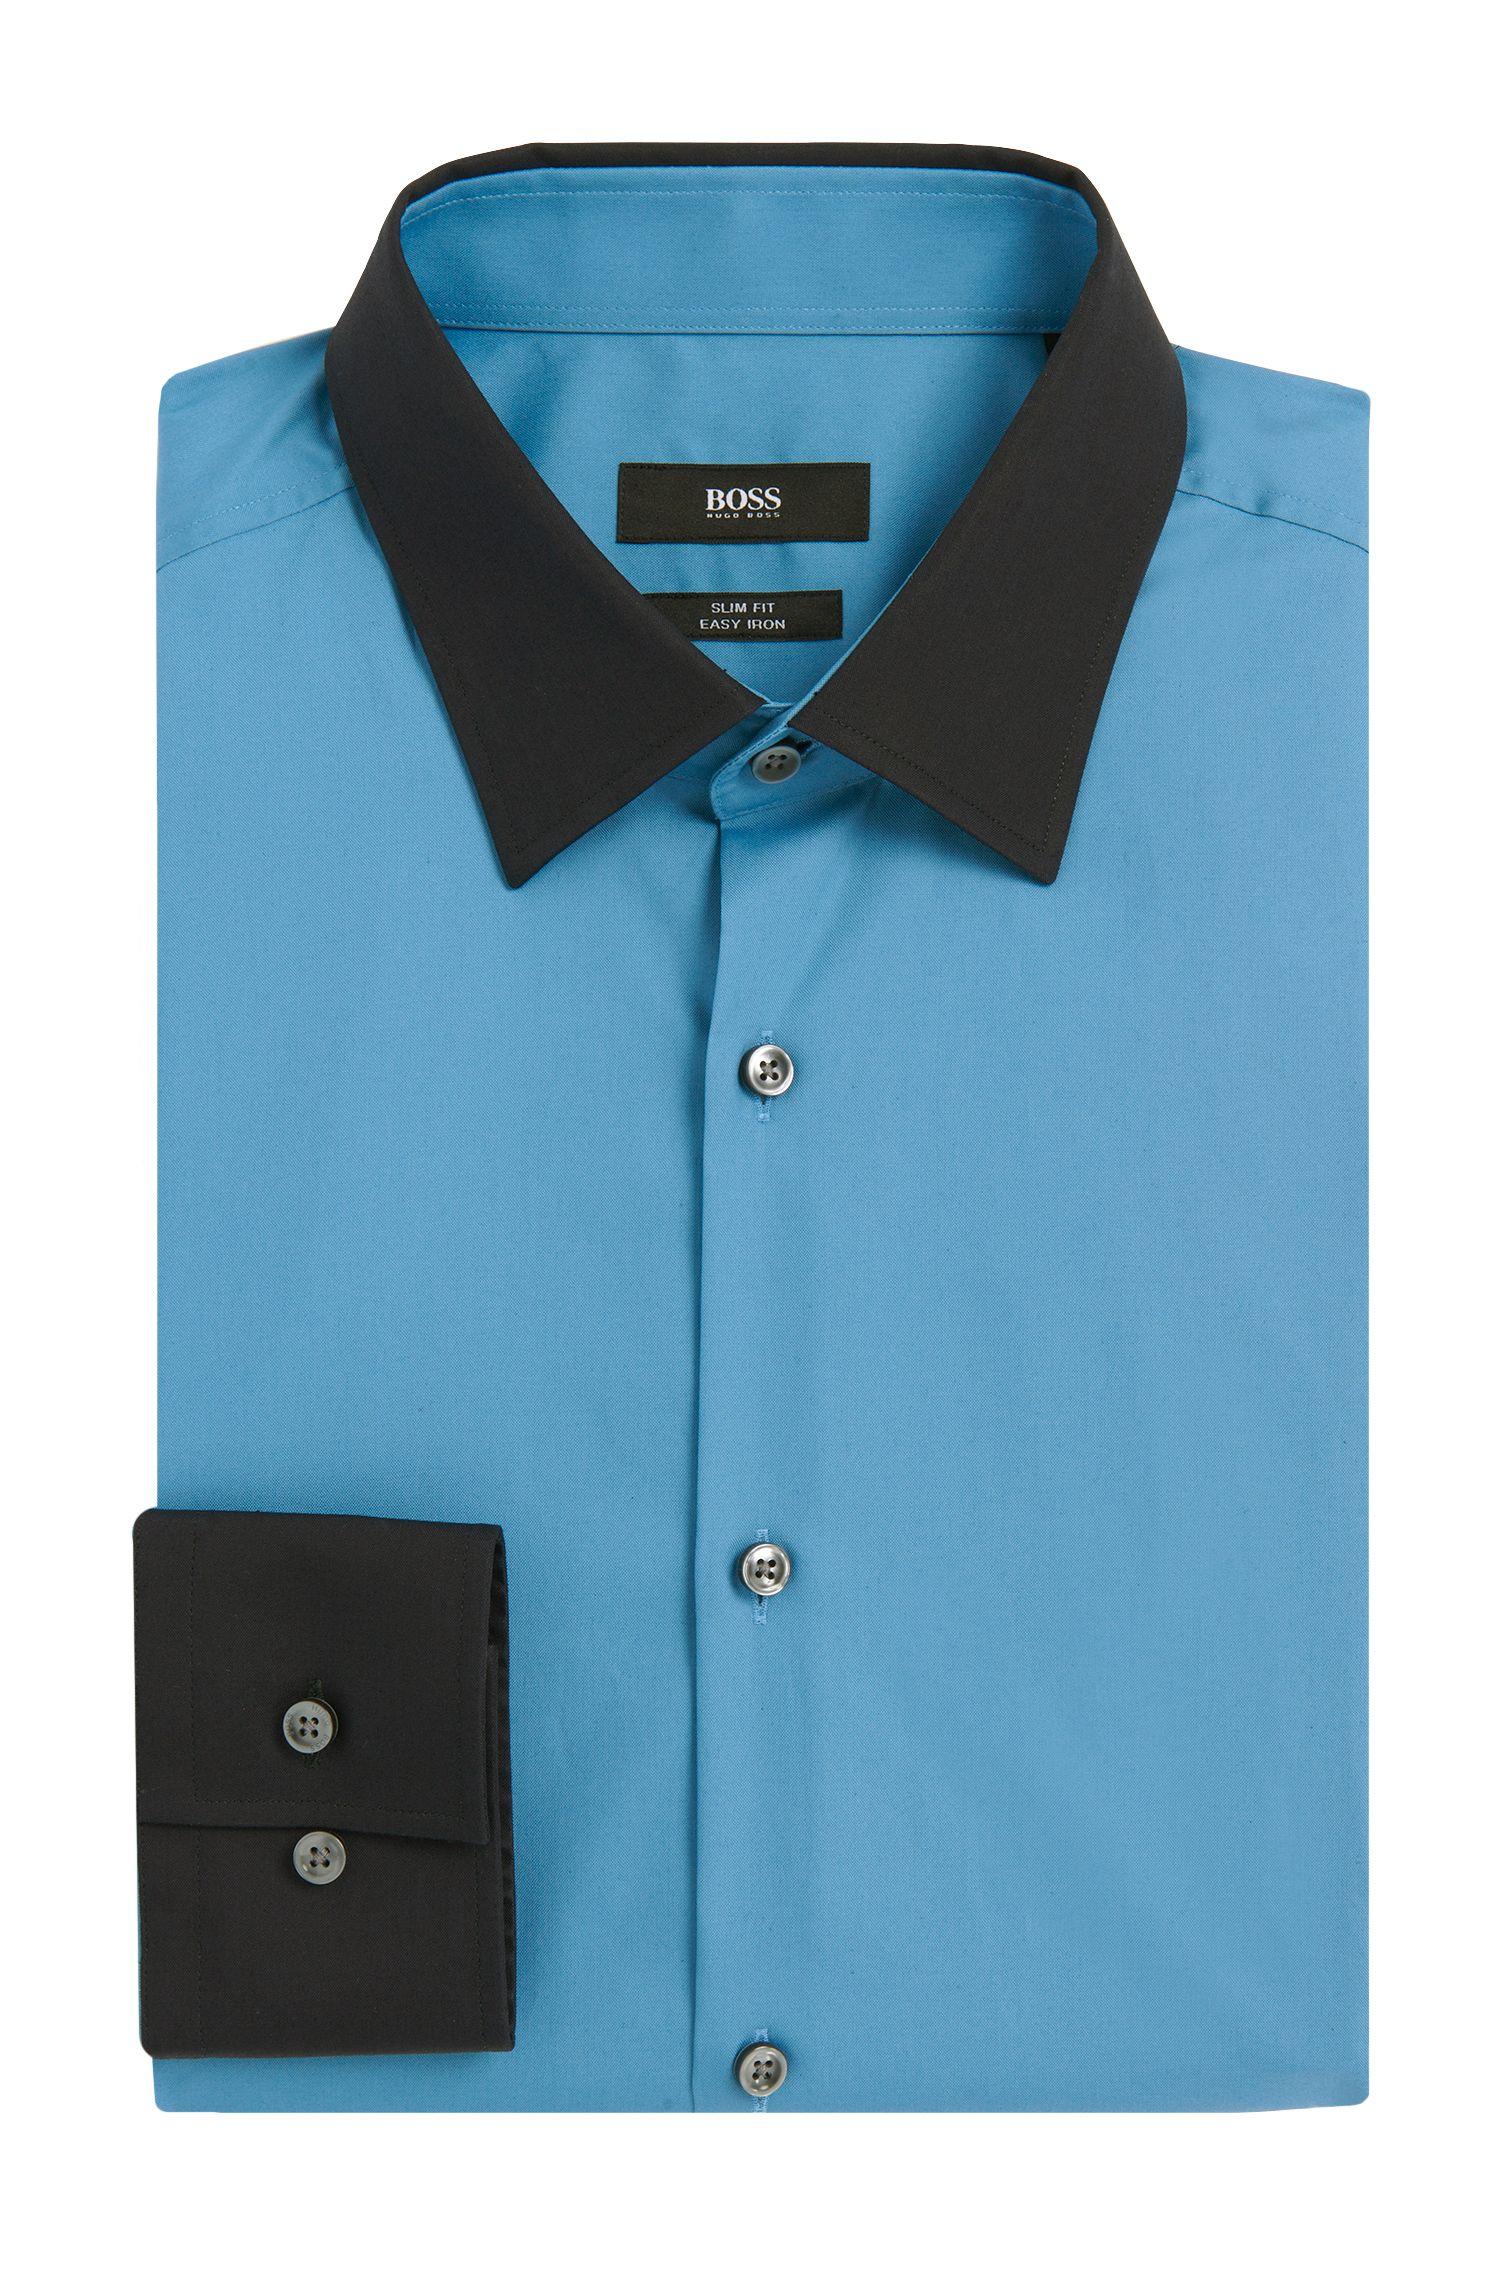 Easy-Iron Italian Cotton Dress Shirt, Slim Fit | Jonnes